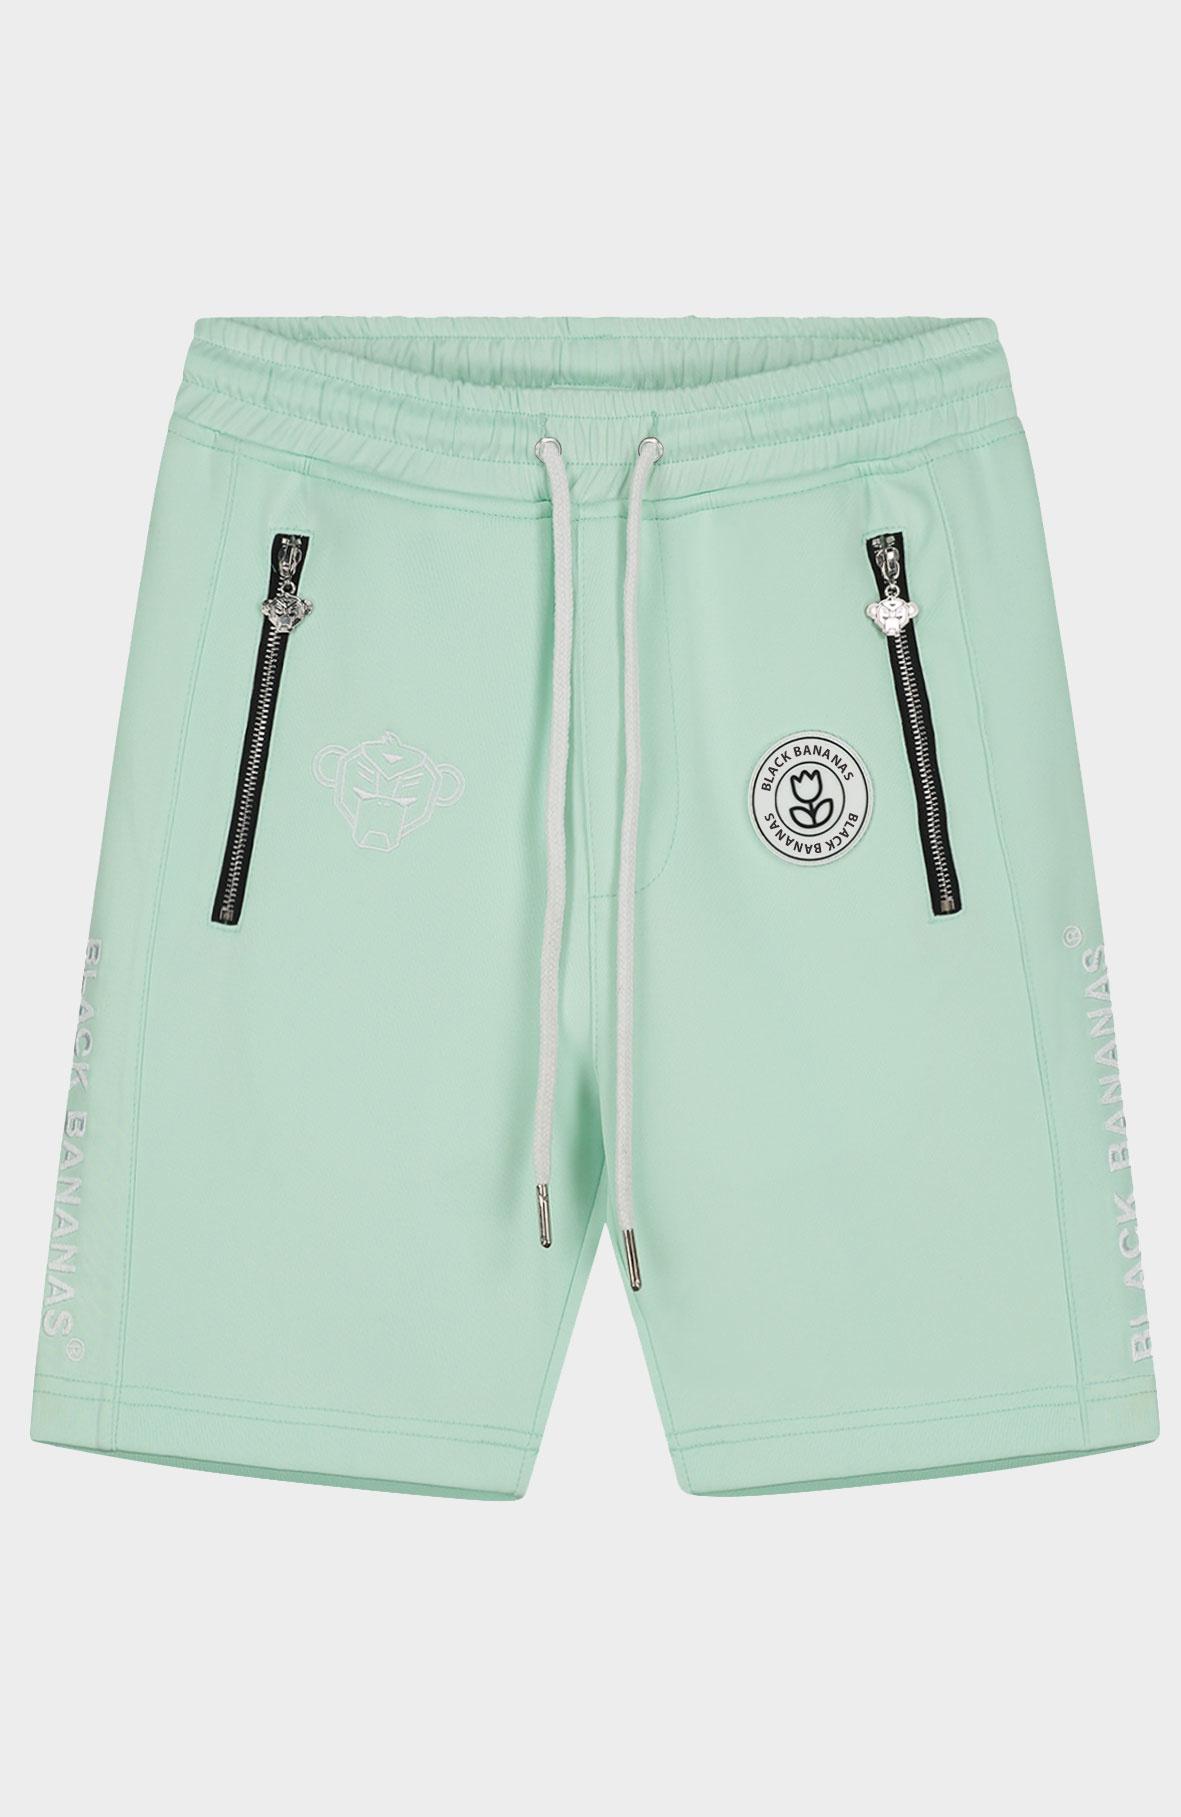 Jr. F.C. Basic Short Mint-1